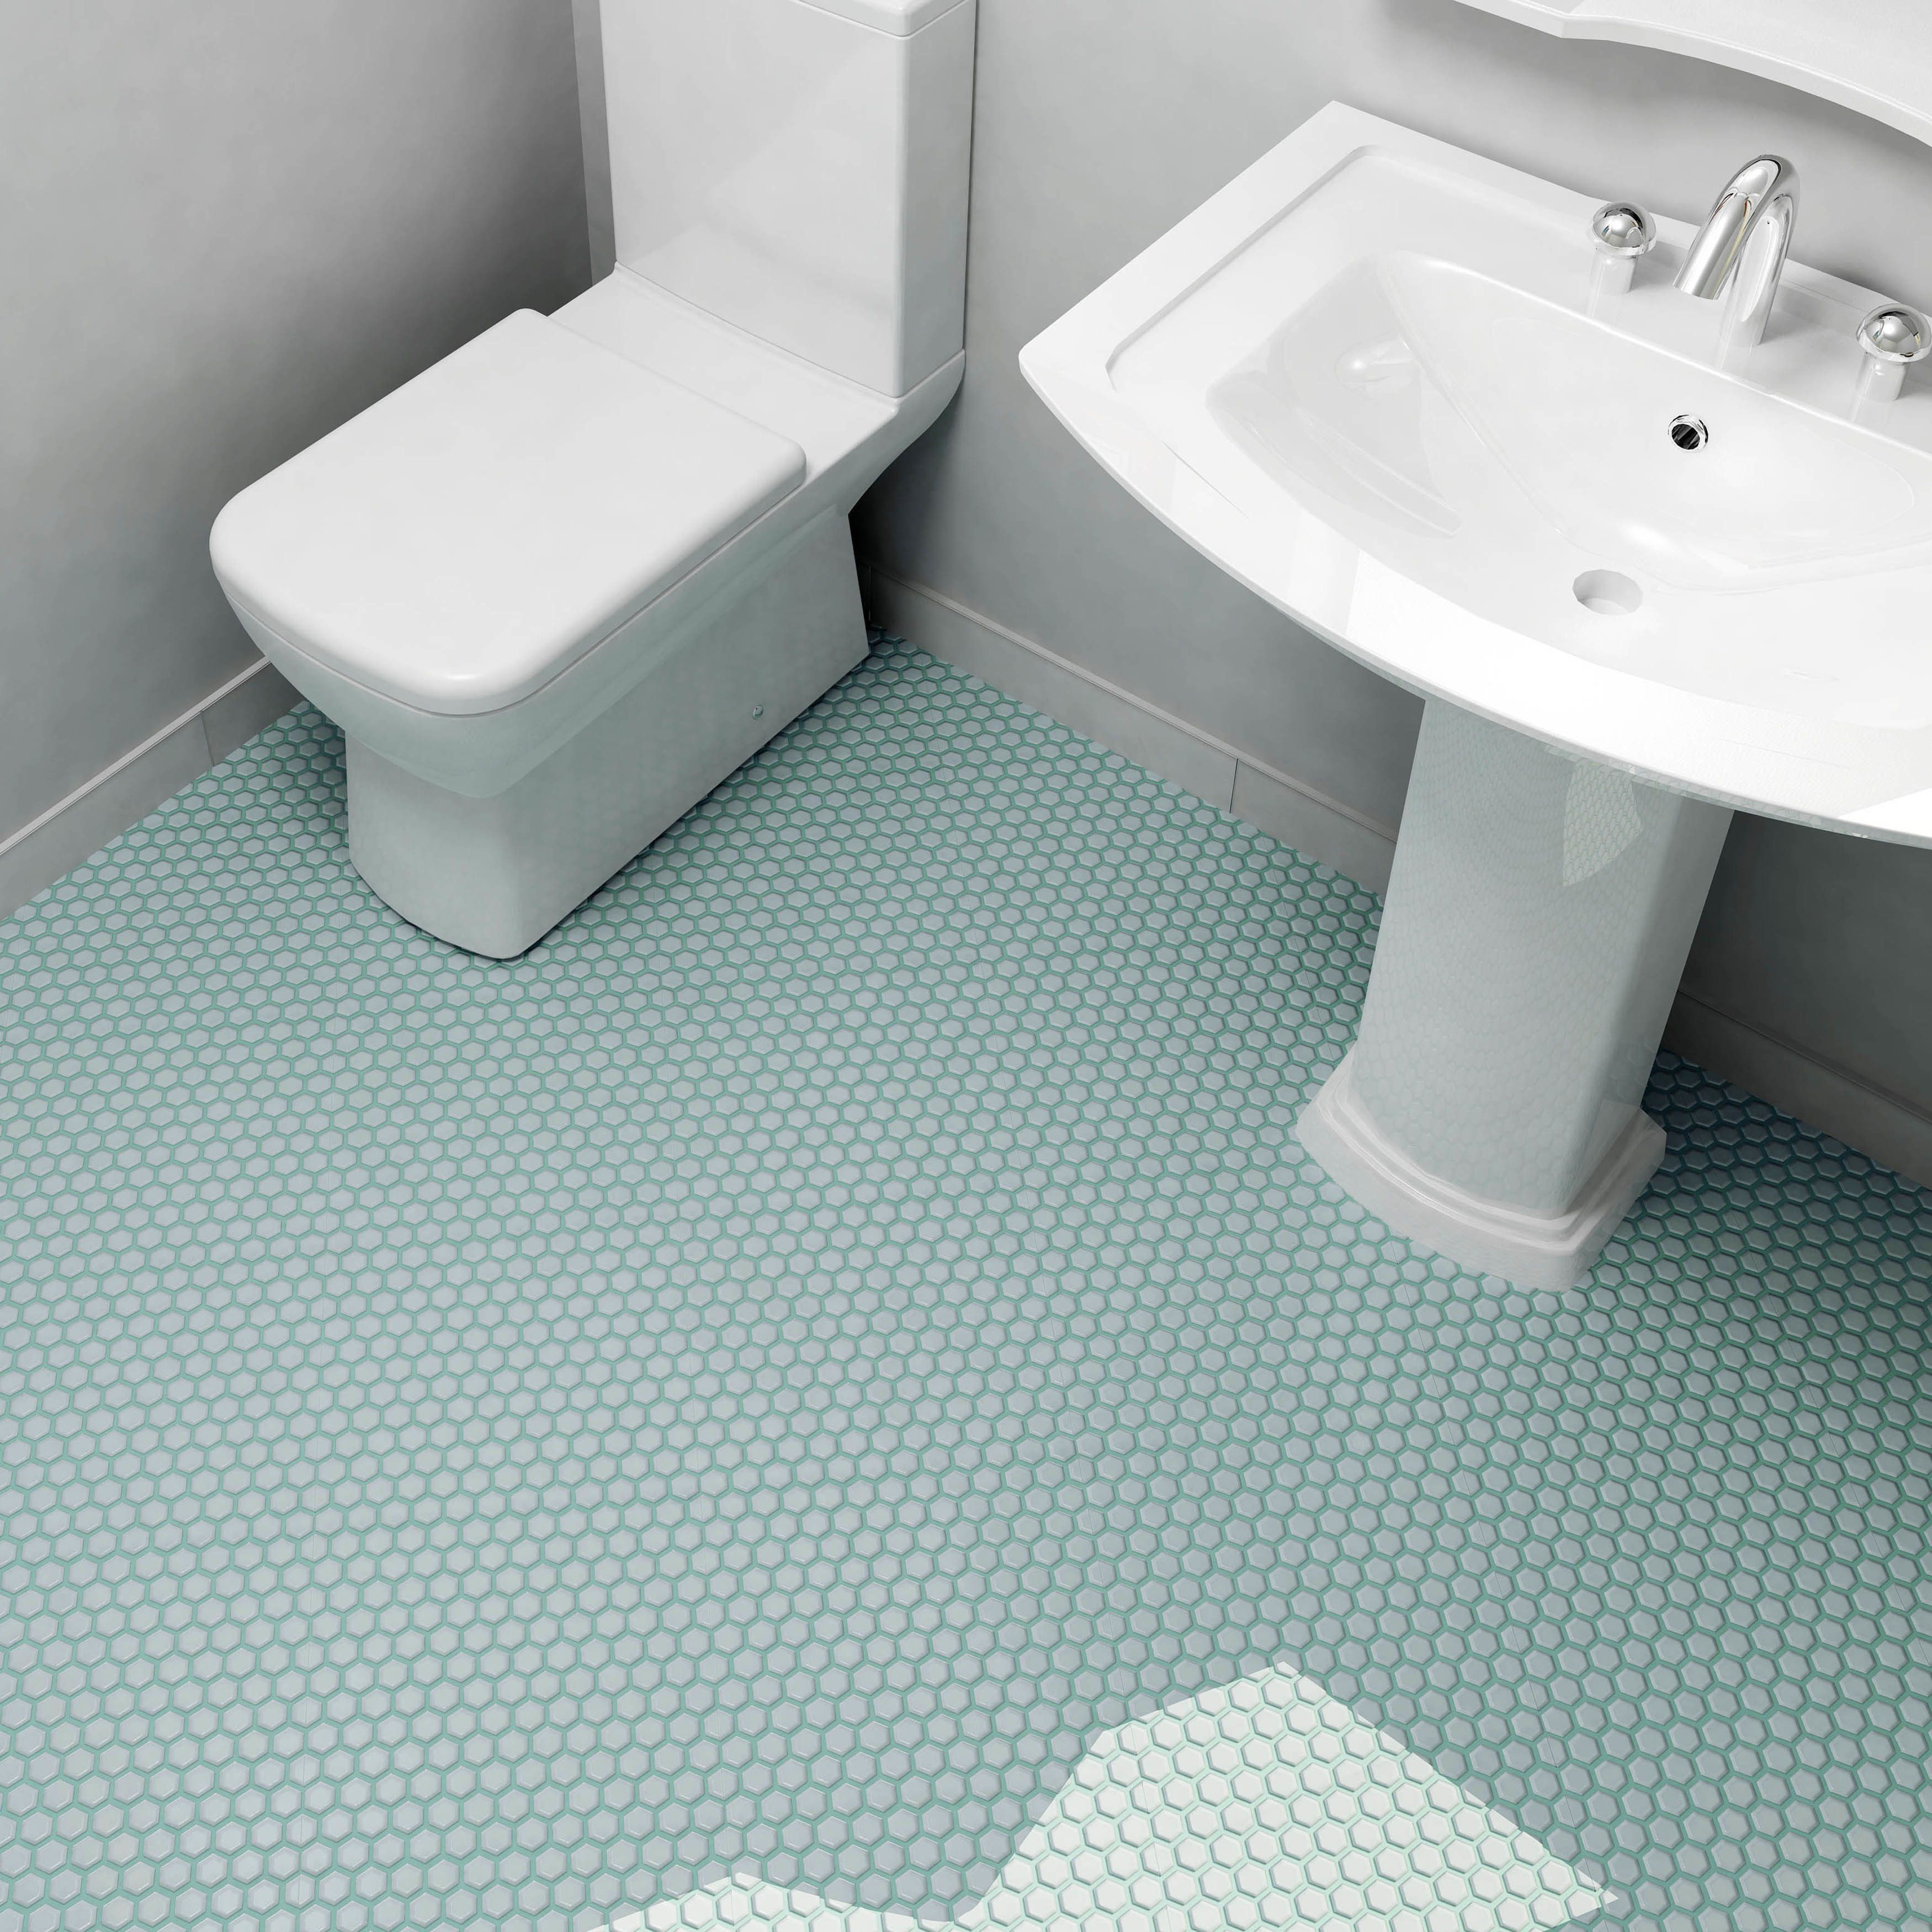 "EliteTile Retro Hexagon 0.875"" x 0.875"" Porcelain Mosaic Tile in Matte Light Blue"